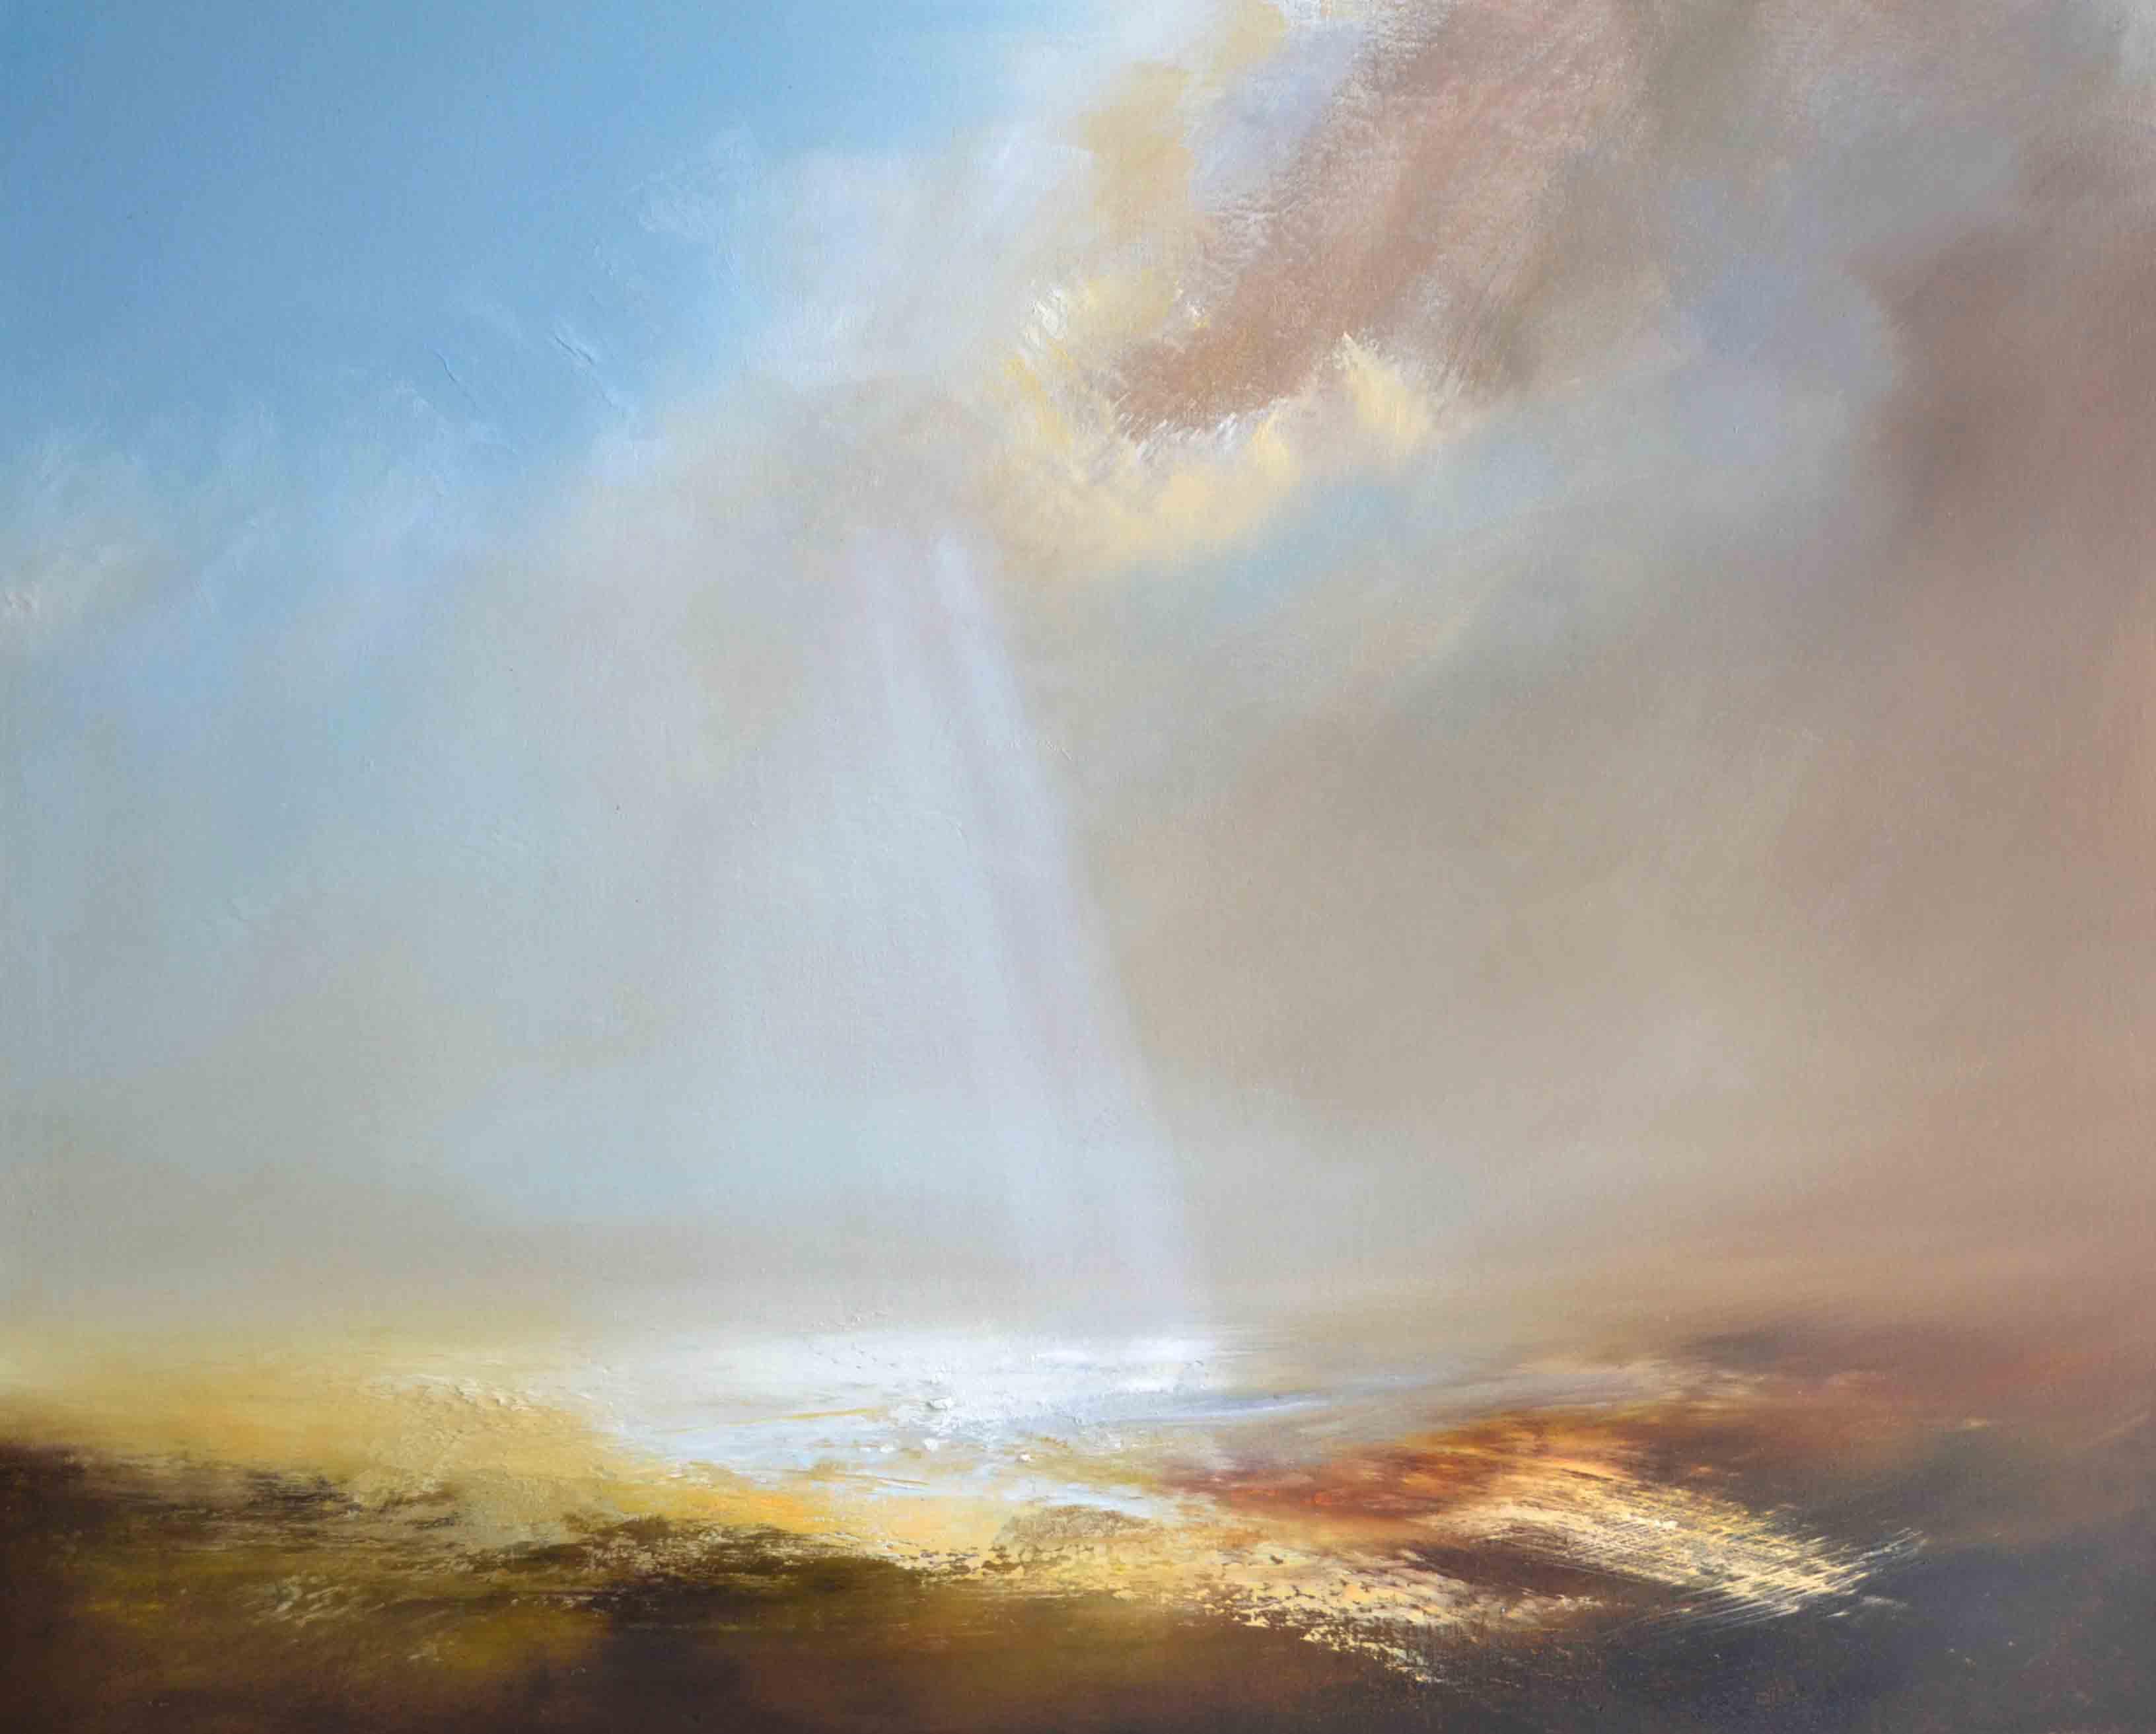 Changing Seasons II by David Taylor